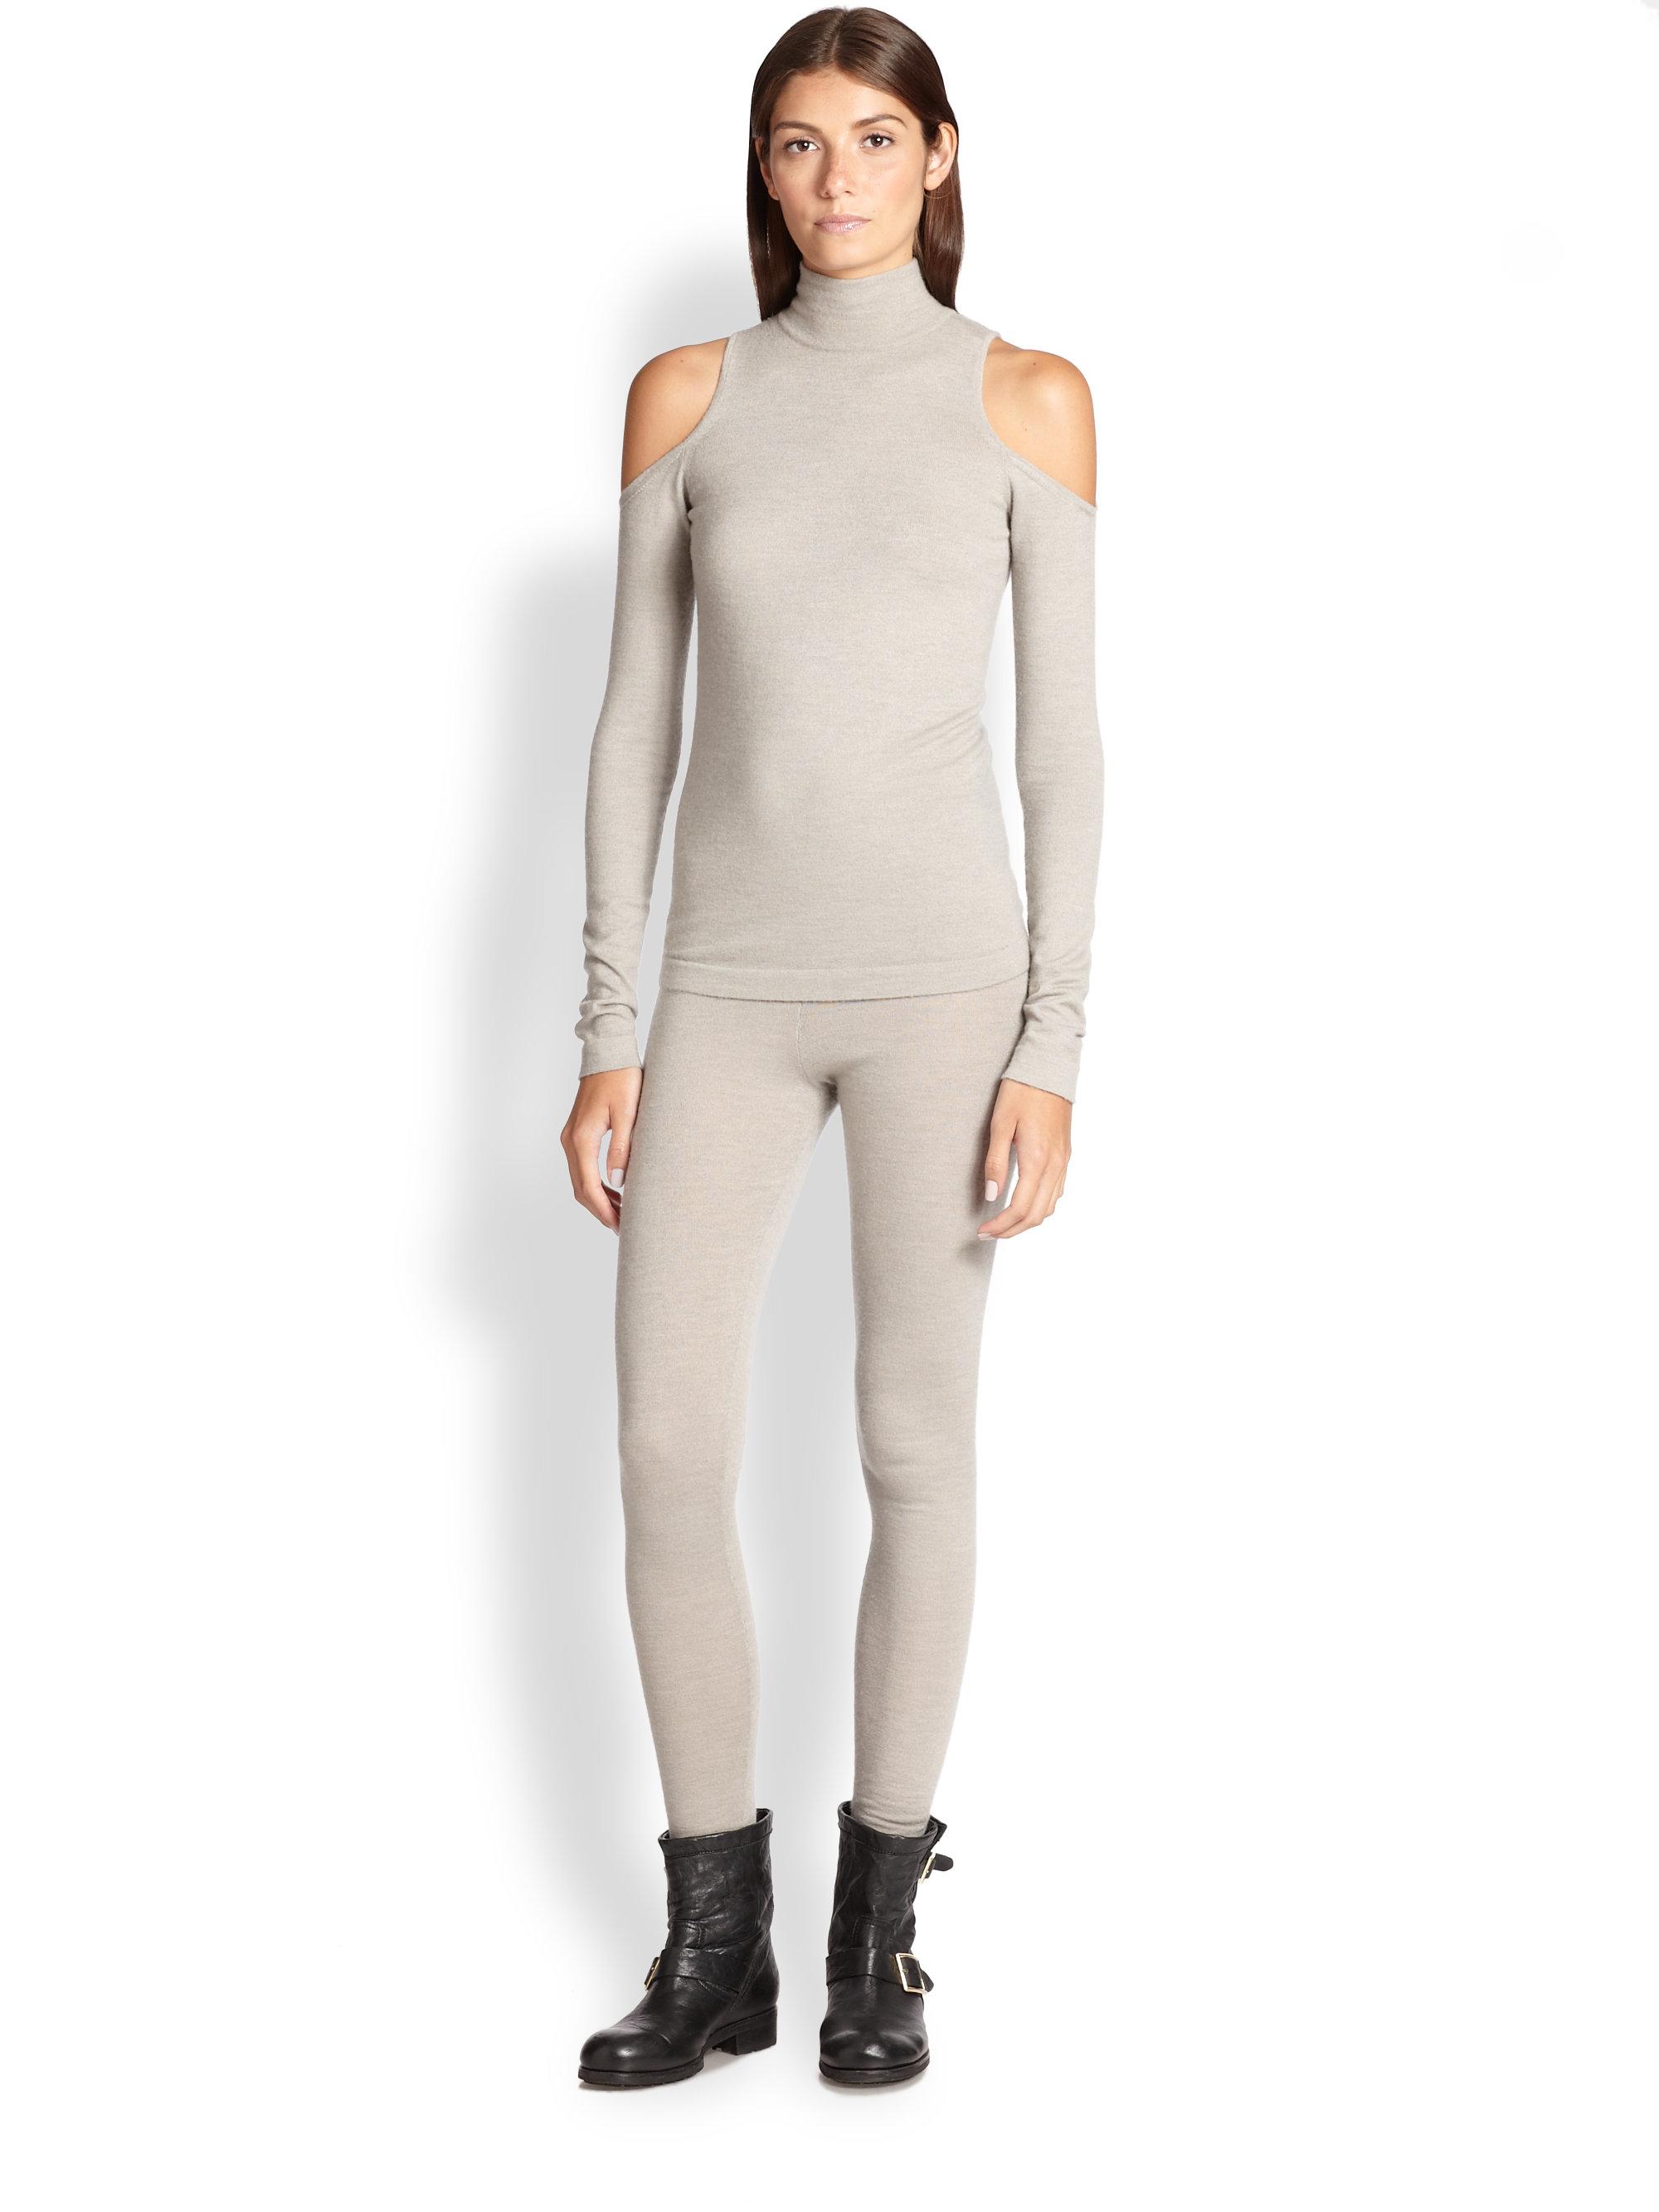 lyst donna karan stretch cashmere knit leggings in gray. Black Bedroom Furniture Sets. Home Design Ideas